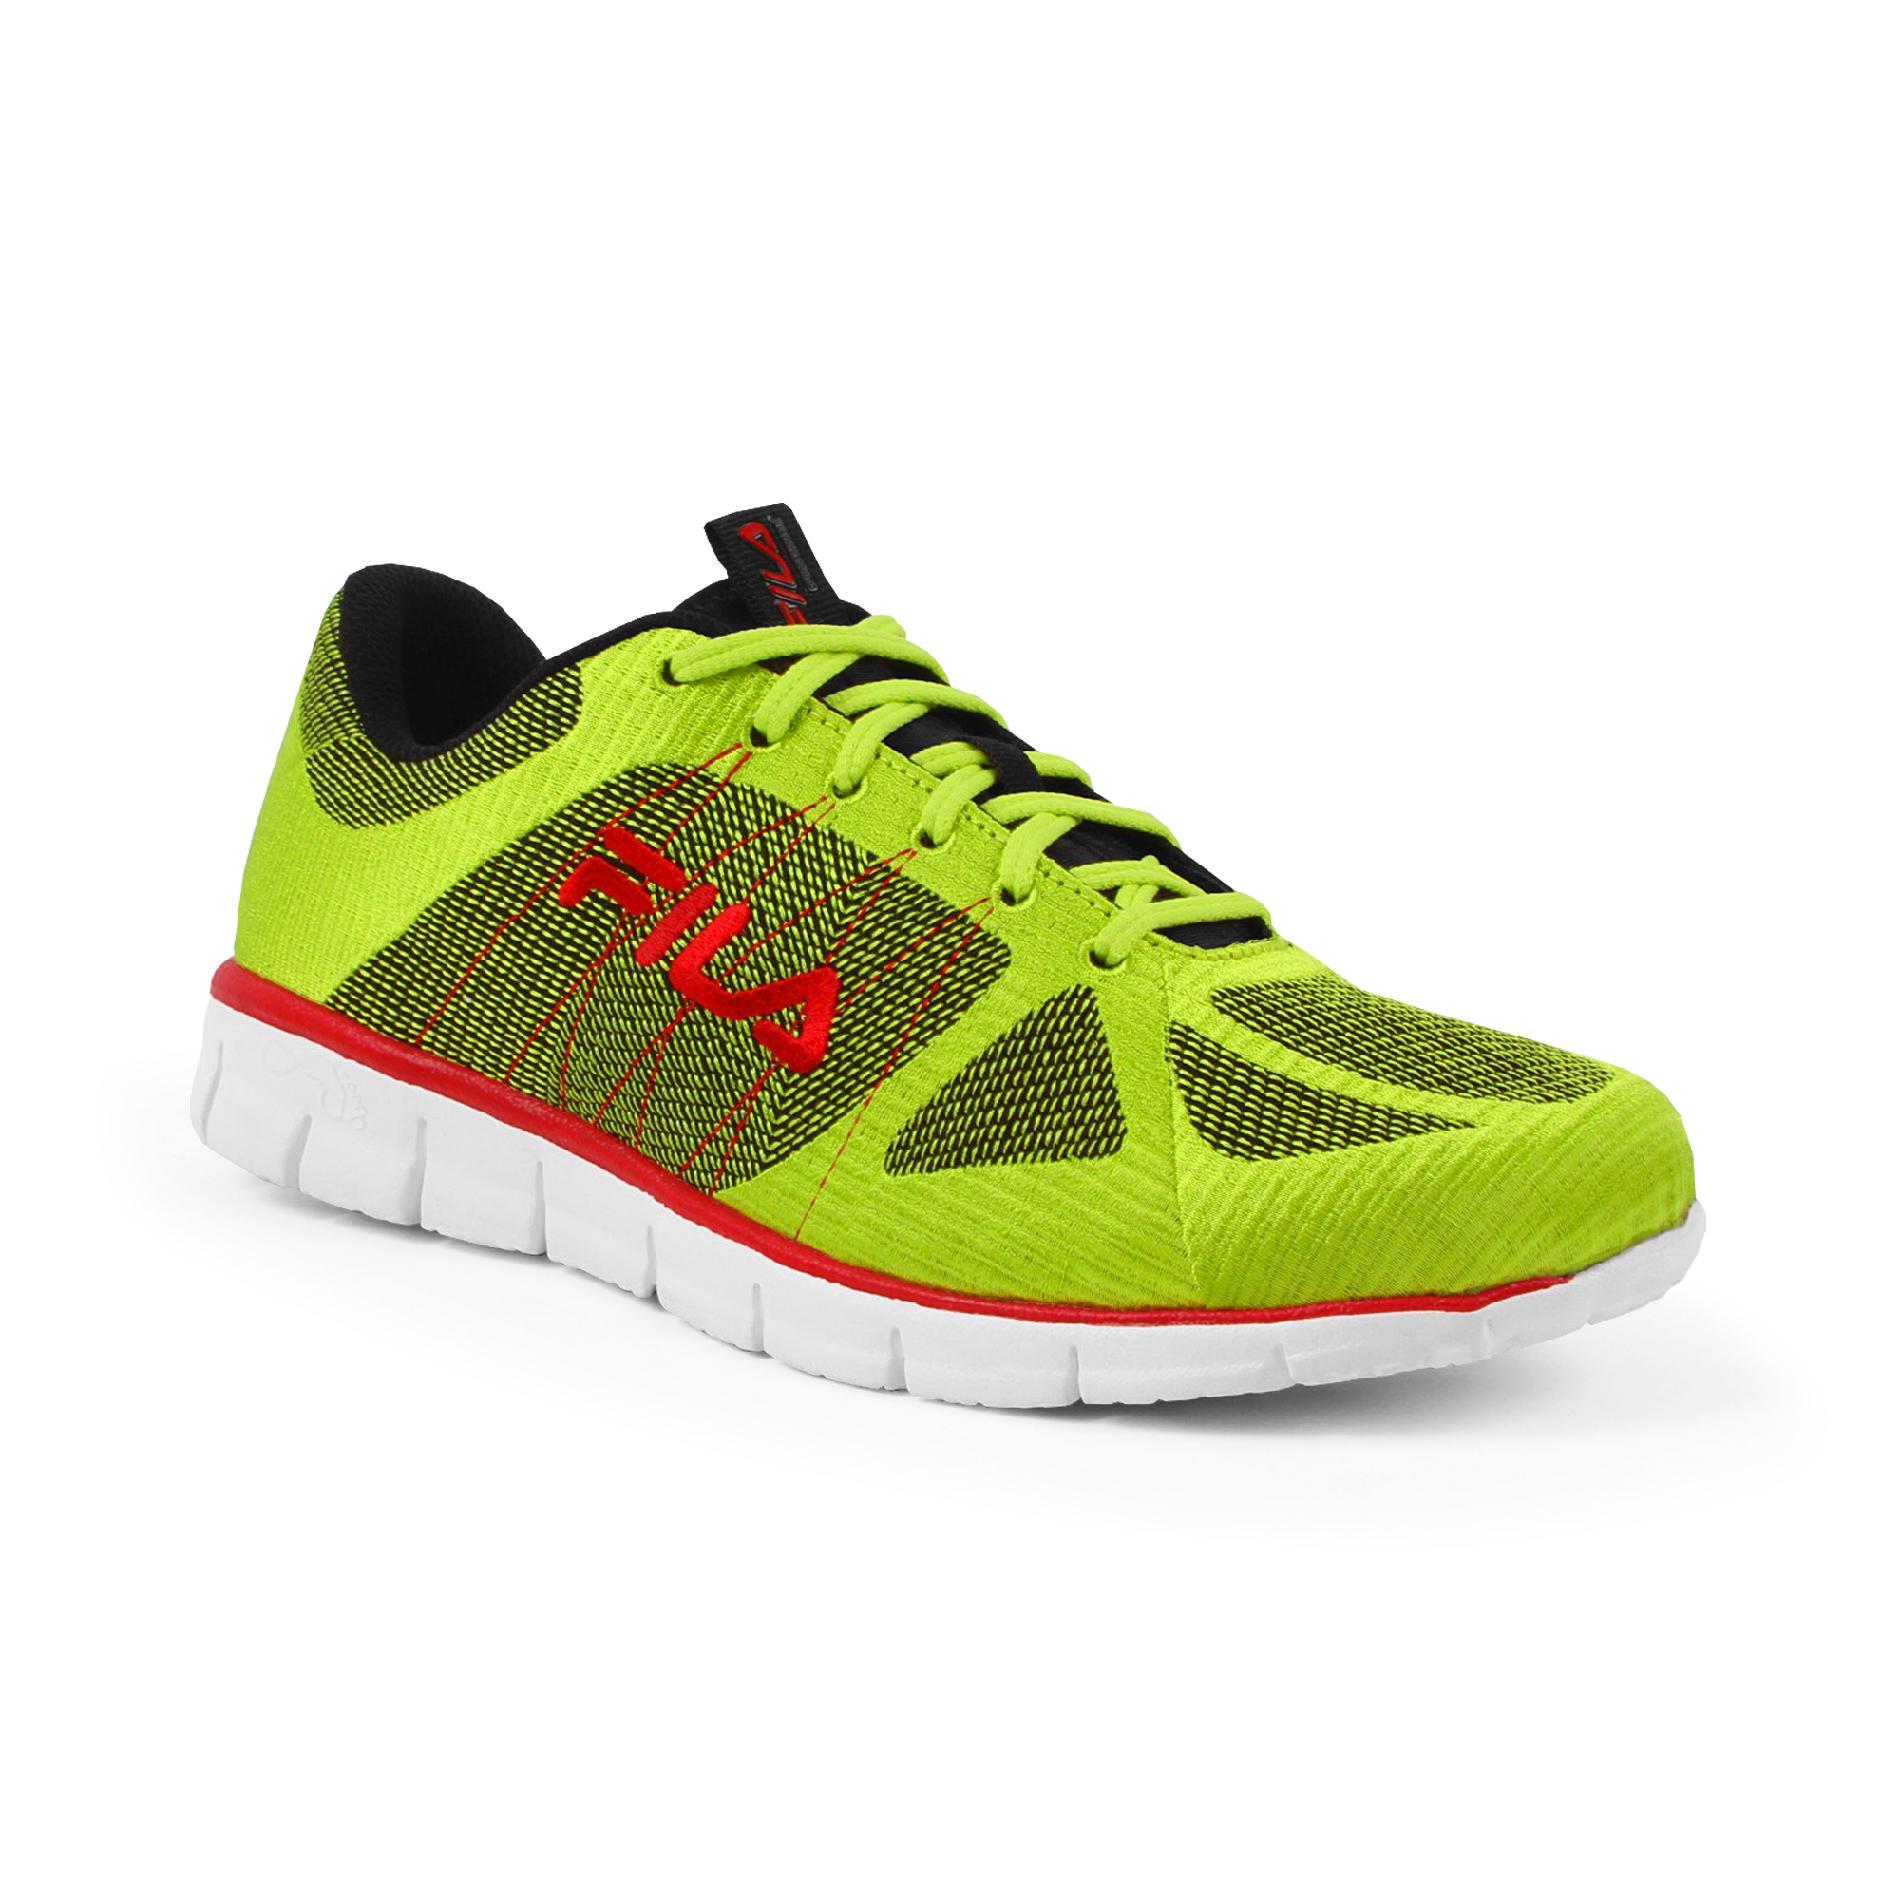 Fila Men's Running Shoe Speedweave - Green